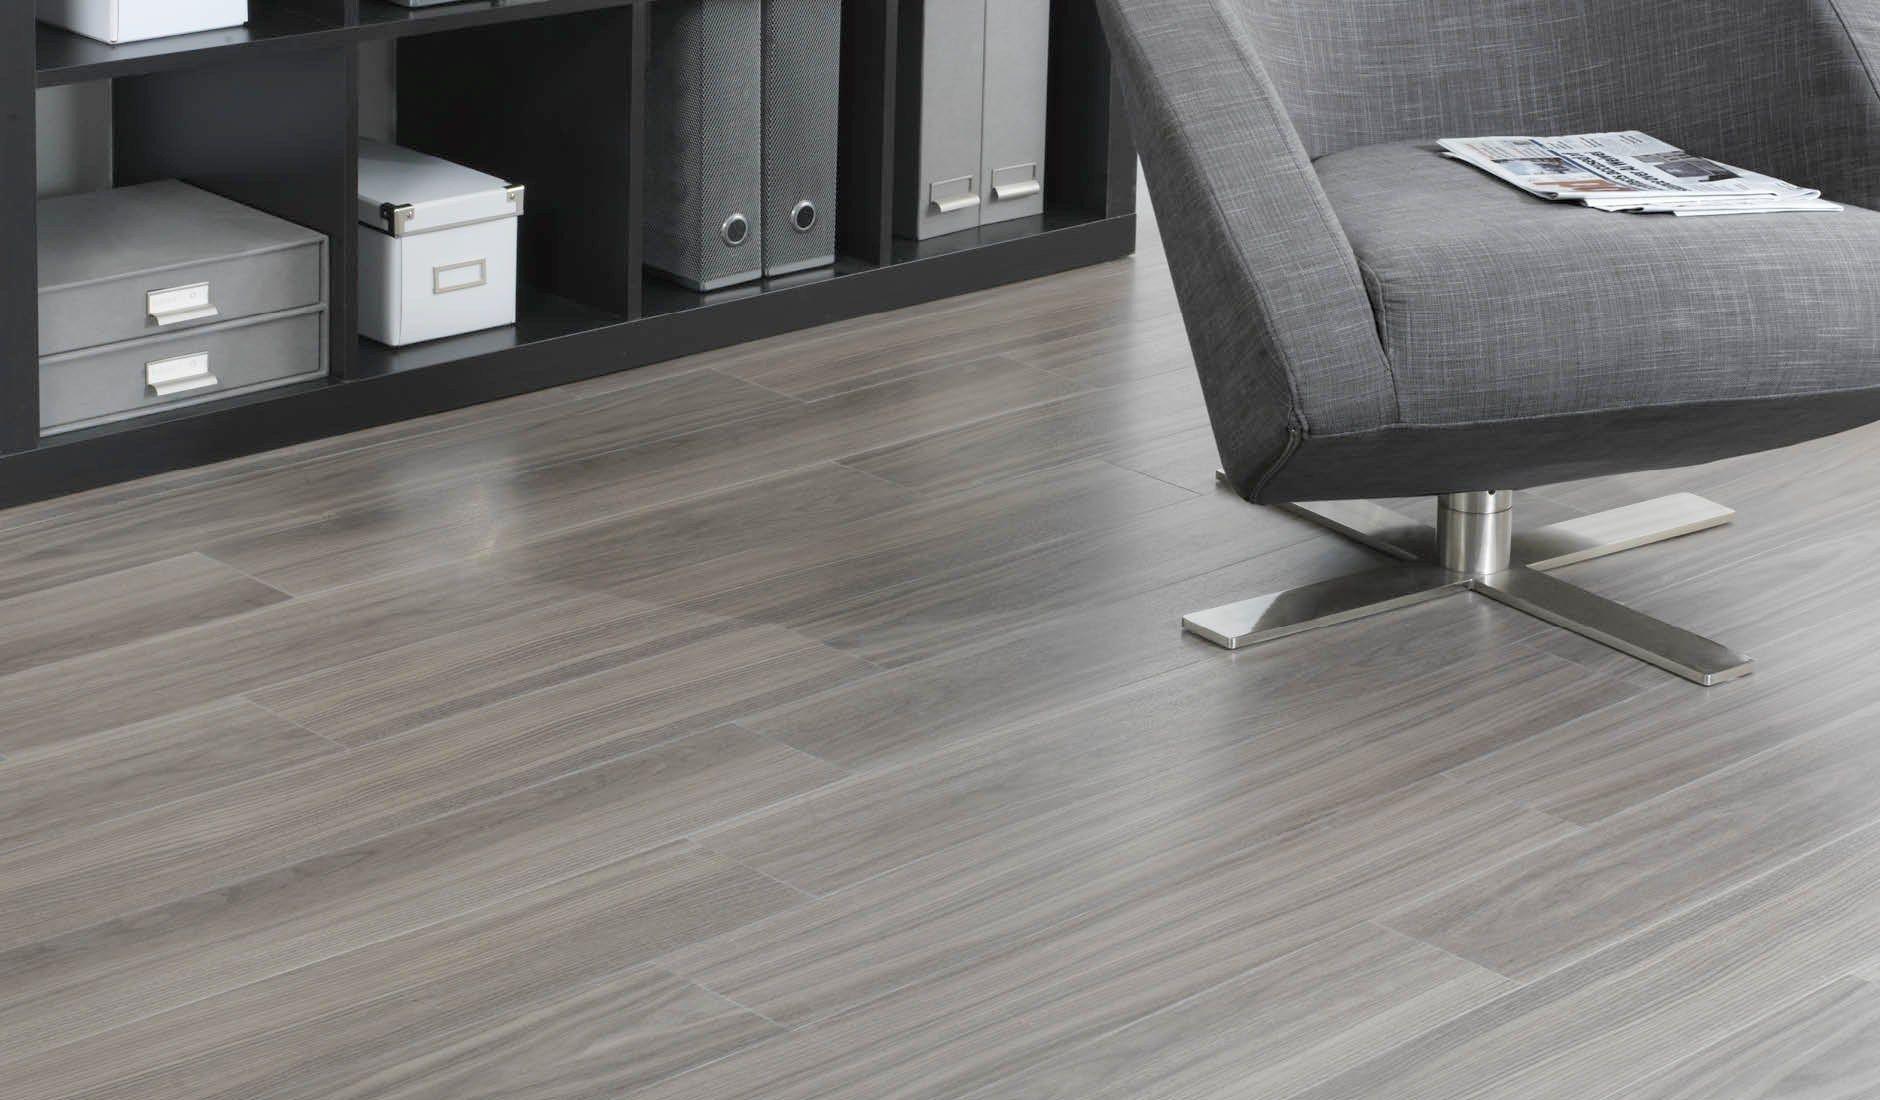 Best Office Flooring In 2020 House Furniture Design Laminate